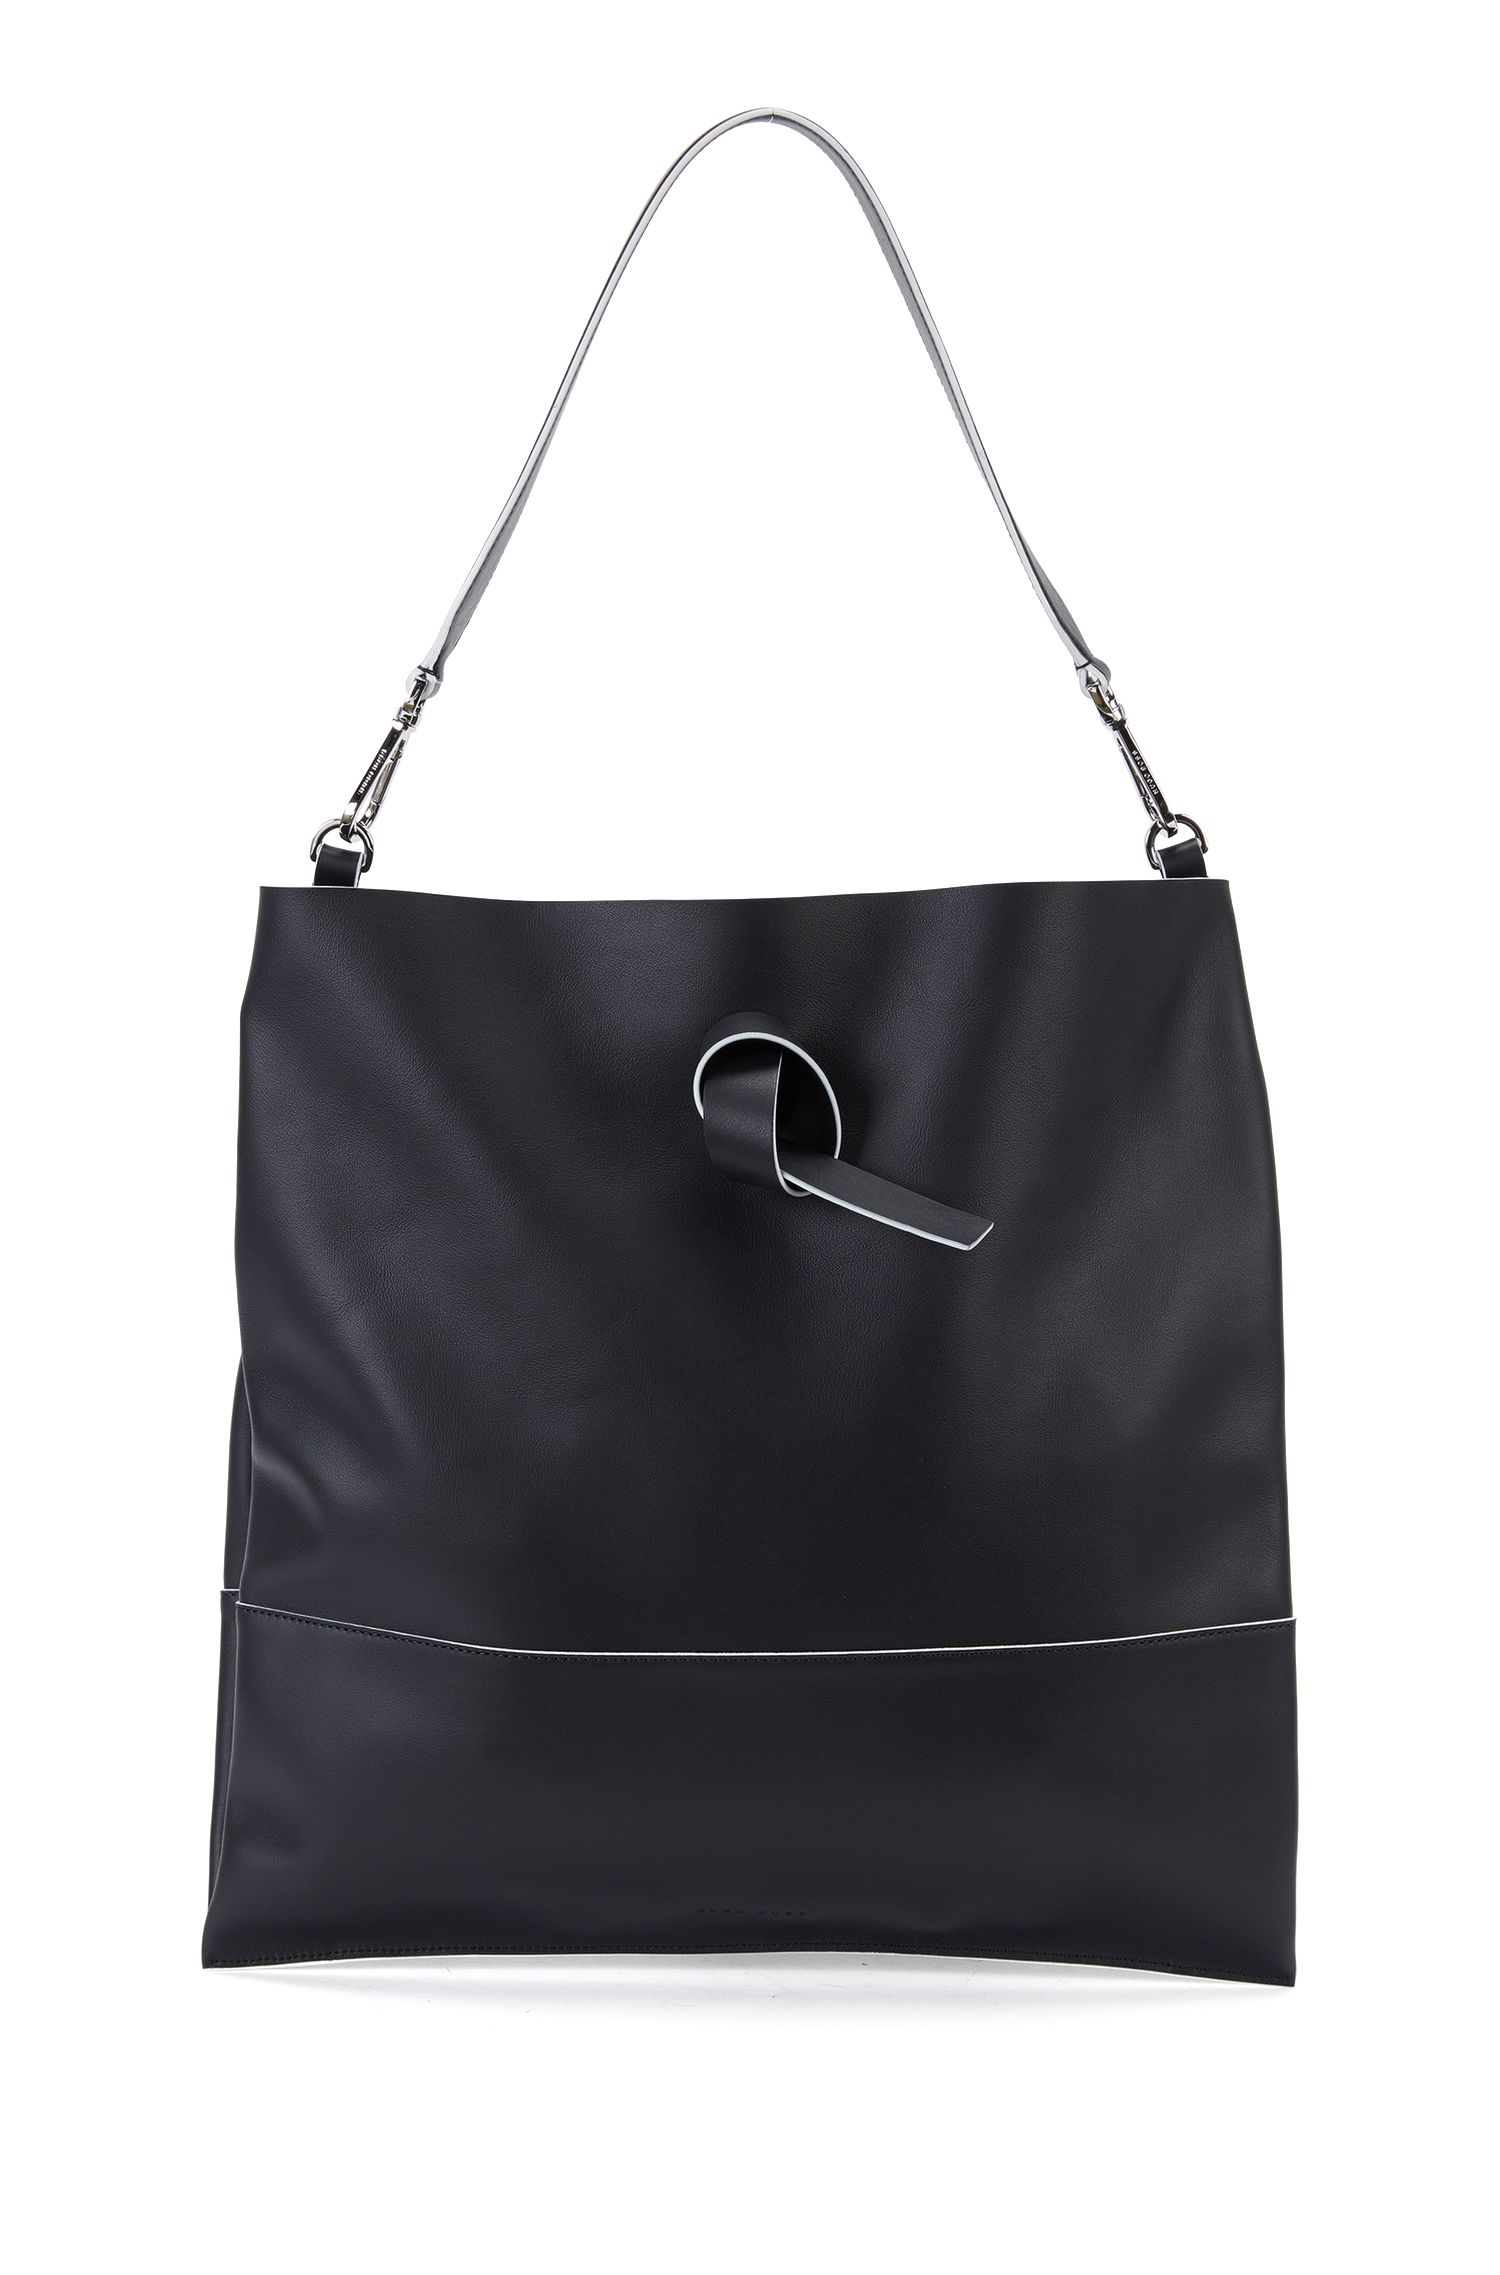 Italian Leather Handbag | Modern Day Tote